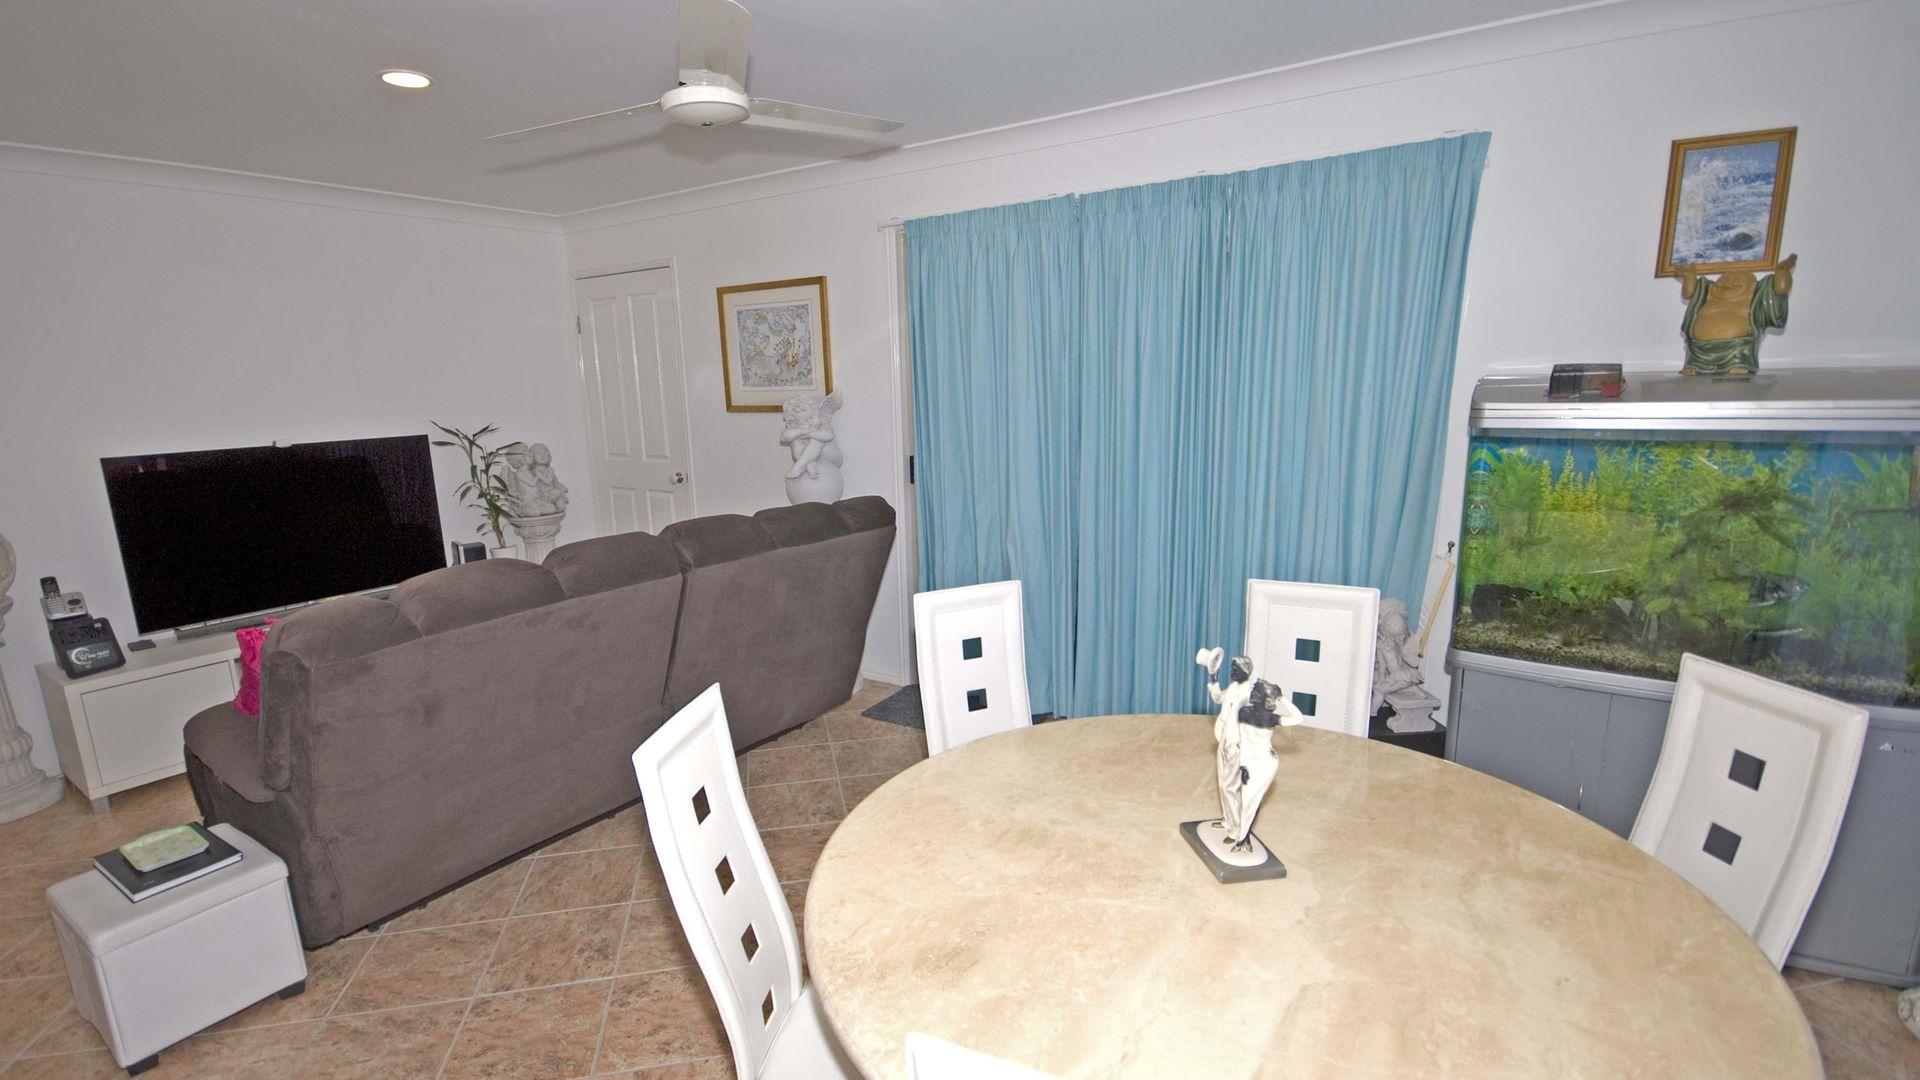 52/90 Caloundra Road, Little Mountain QLD 4551, Image 1